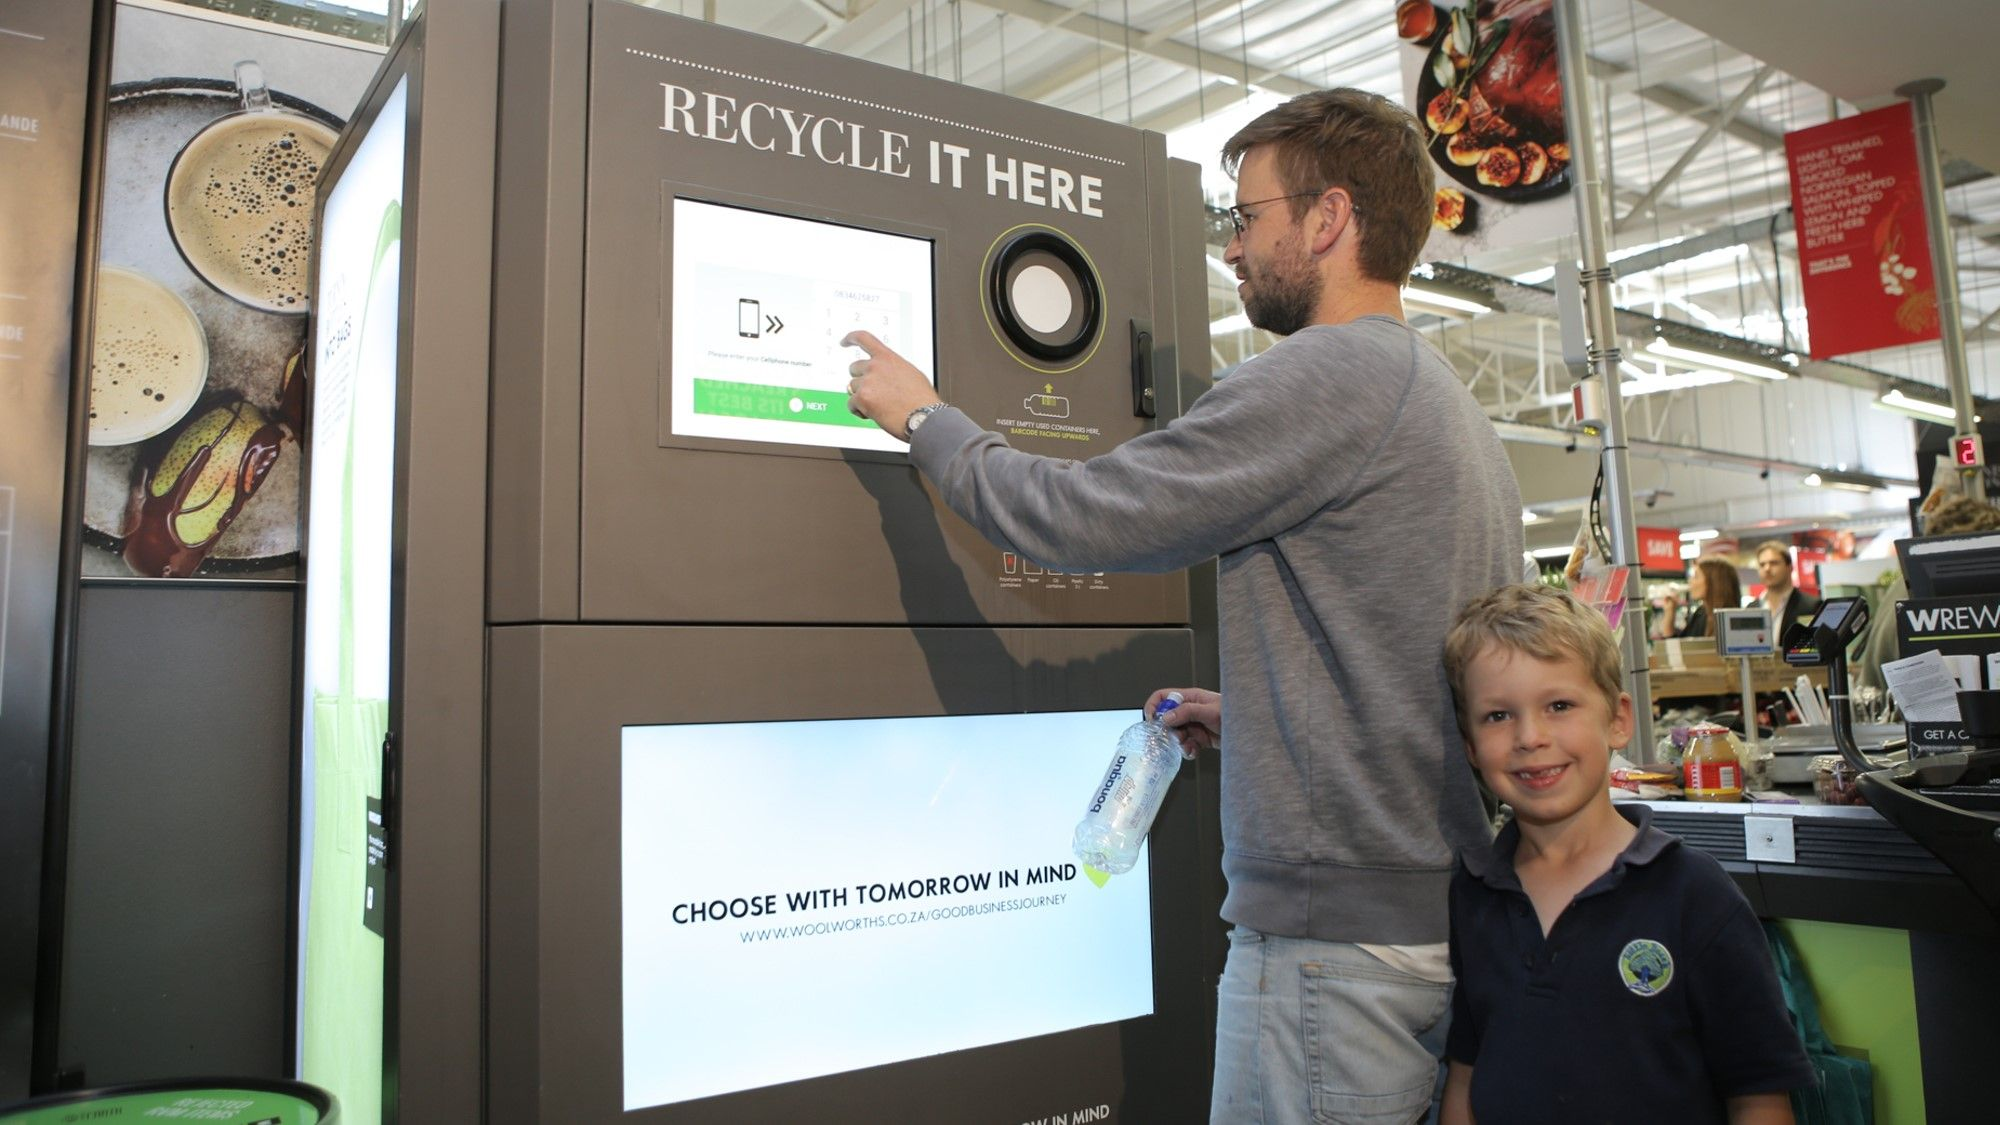 green vending machine